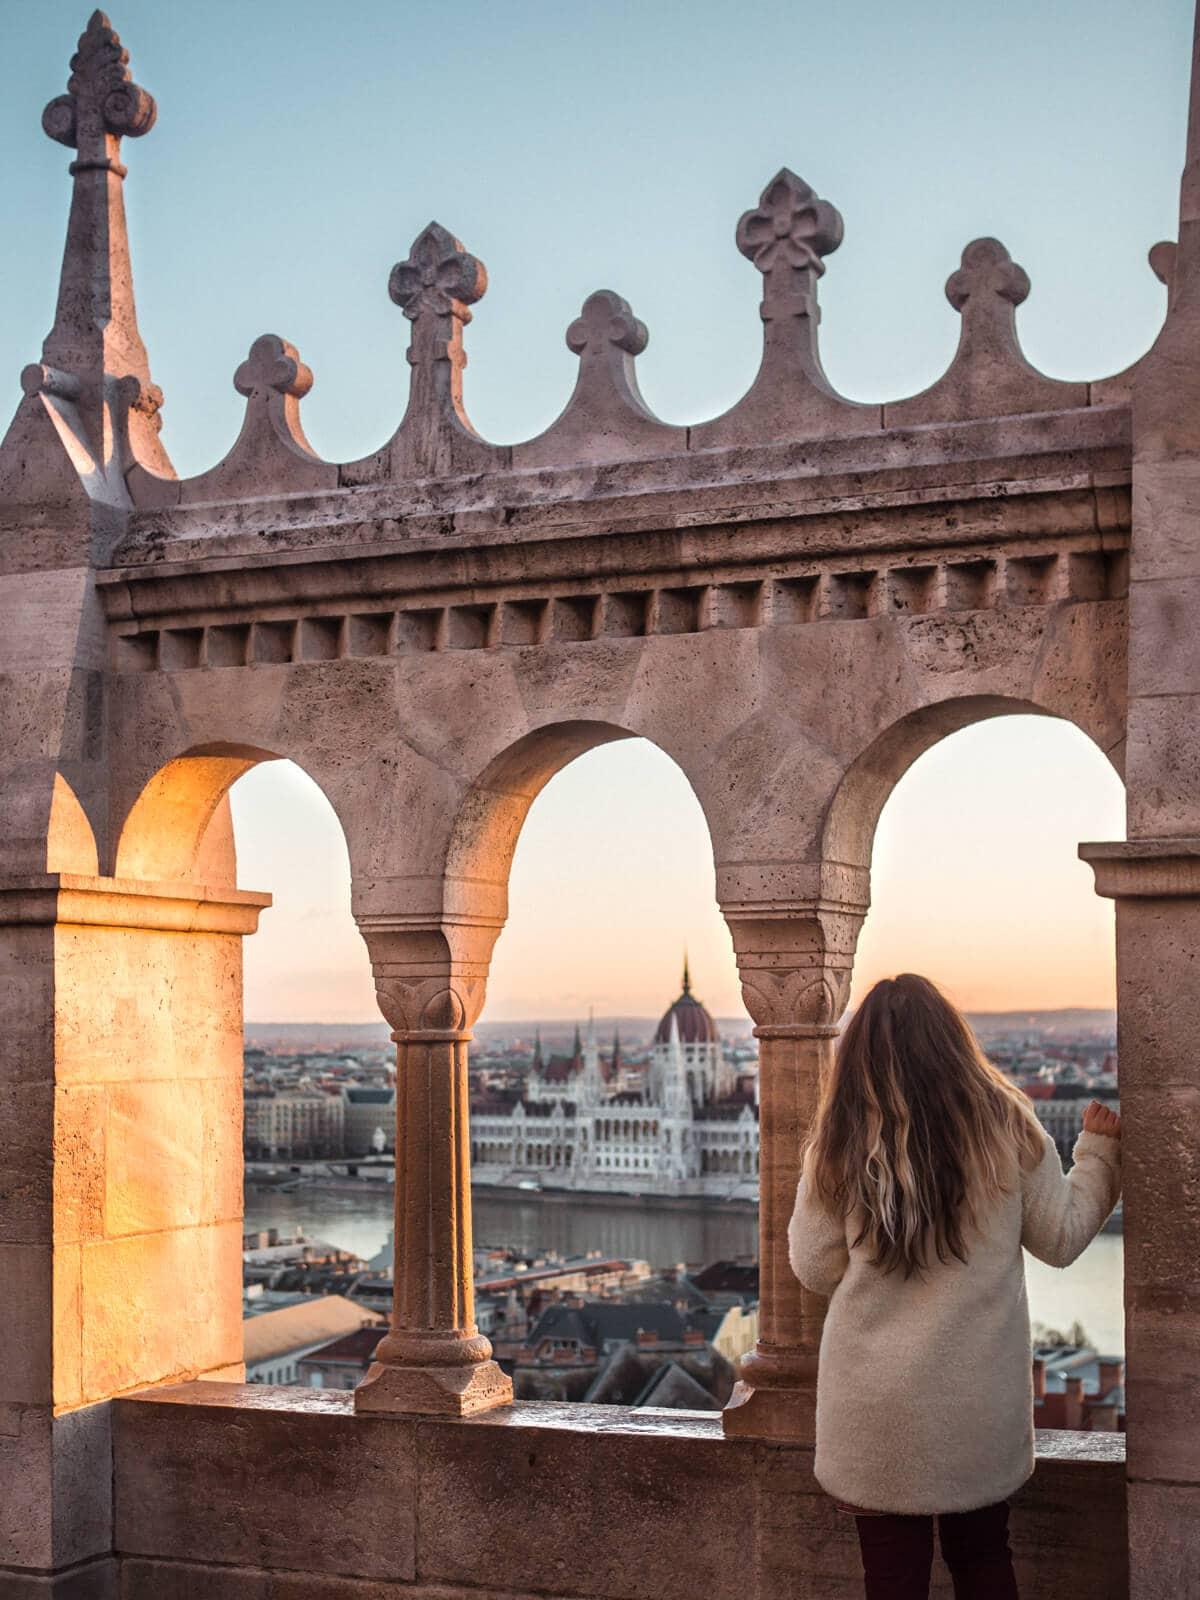 Budapest Instagram photo guide - Sunrise seen from Fisherman's Bastion